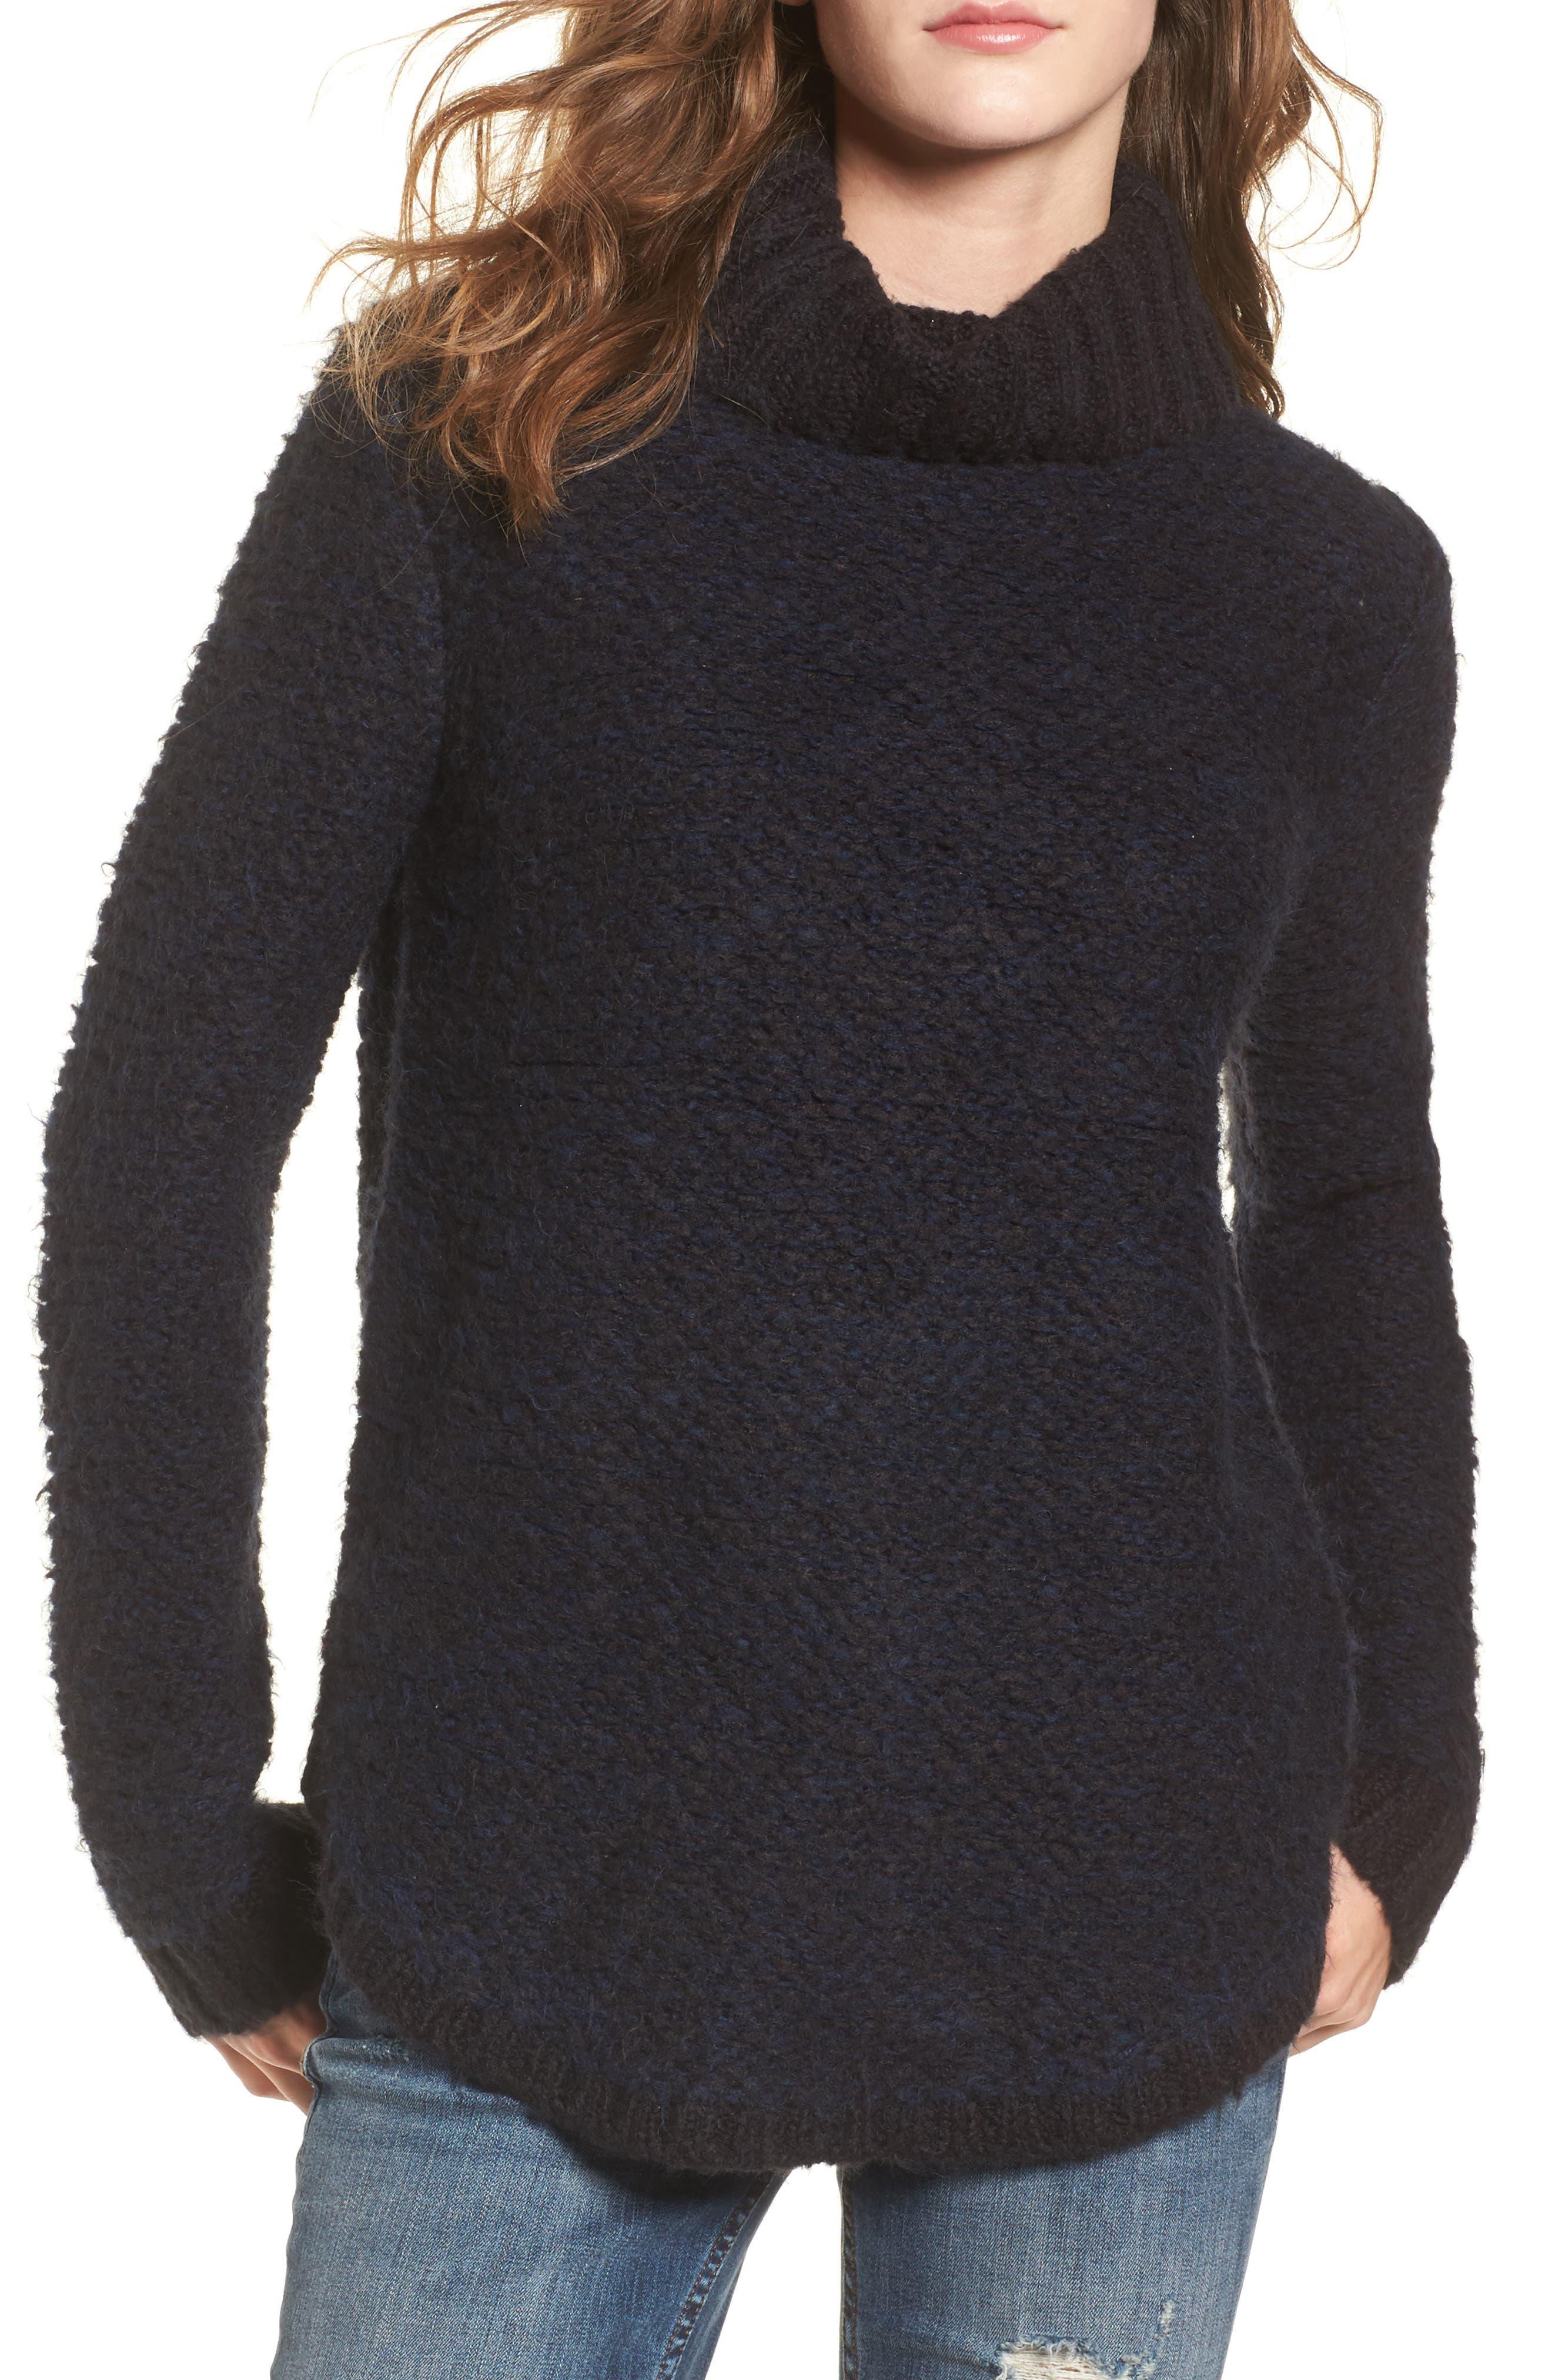 Kinks Turtleneck Sweater,                             Main thumbnail 1, color,